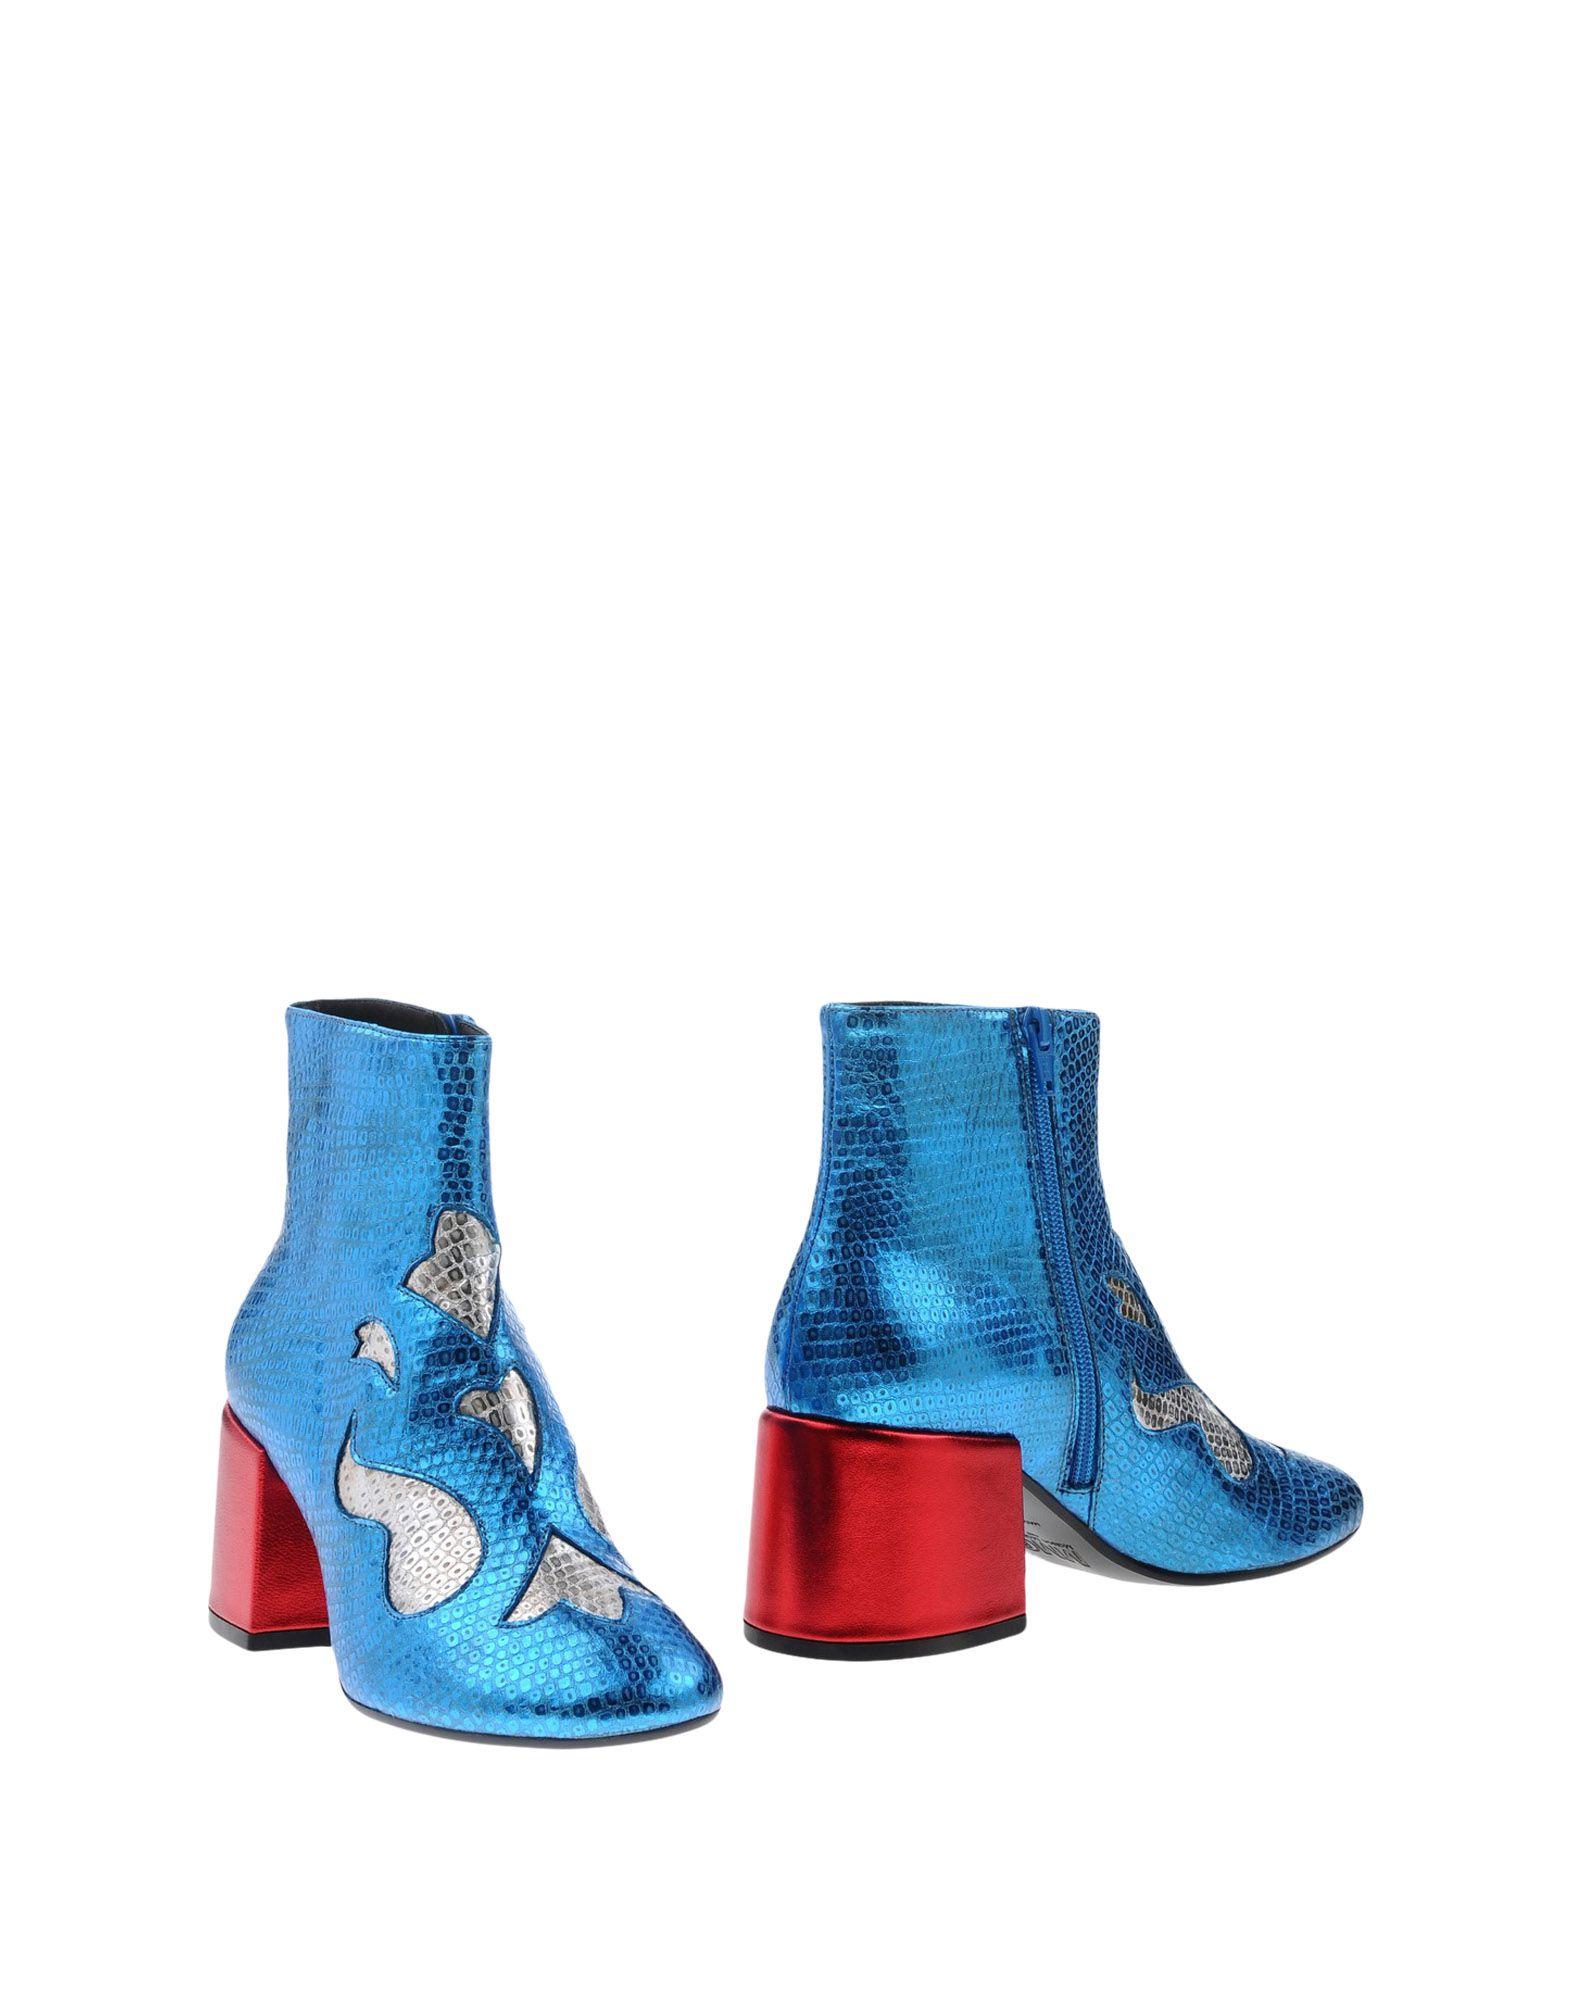 Mm6 Maison Margiela Stiefelette Damen Damen Stiefelette  11331192JP Neue Schuhe 968455